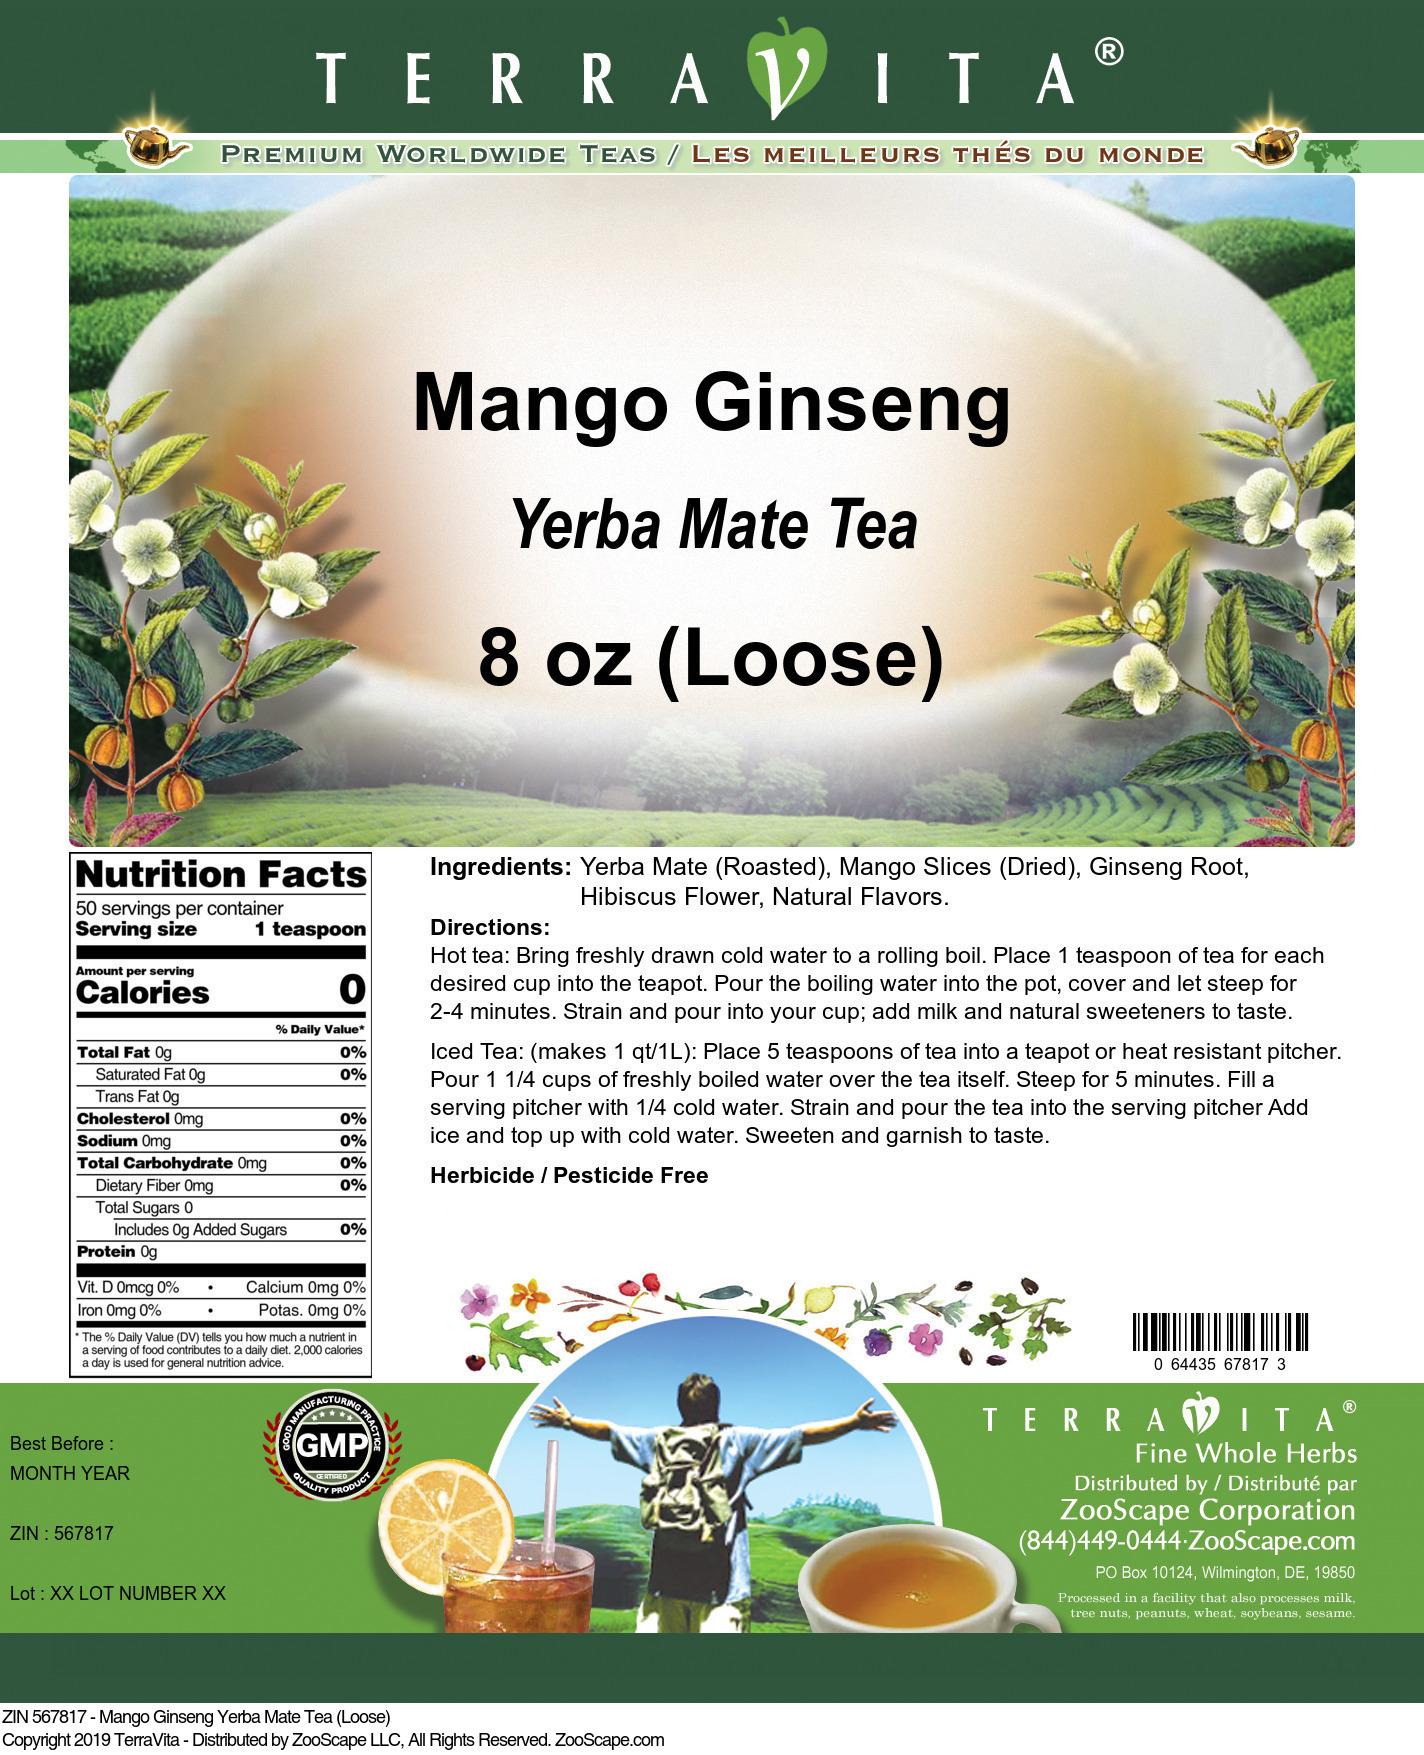 Mango Ginseng Yerba Mate Tea (Loose)